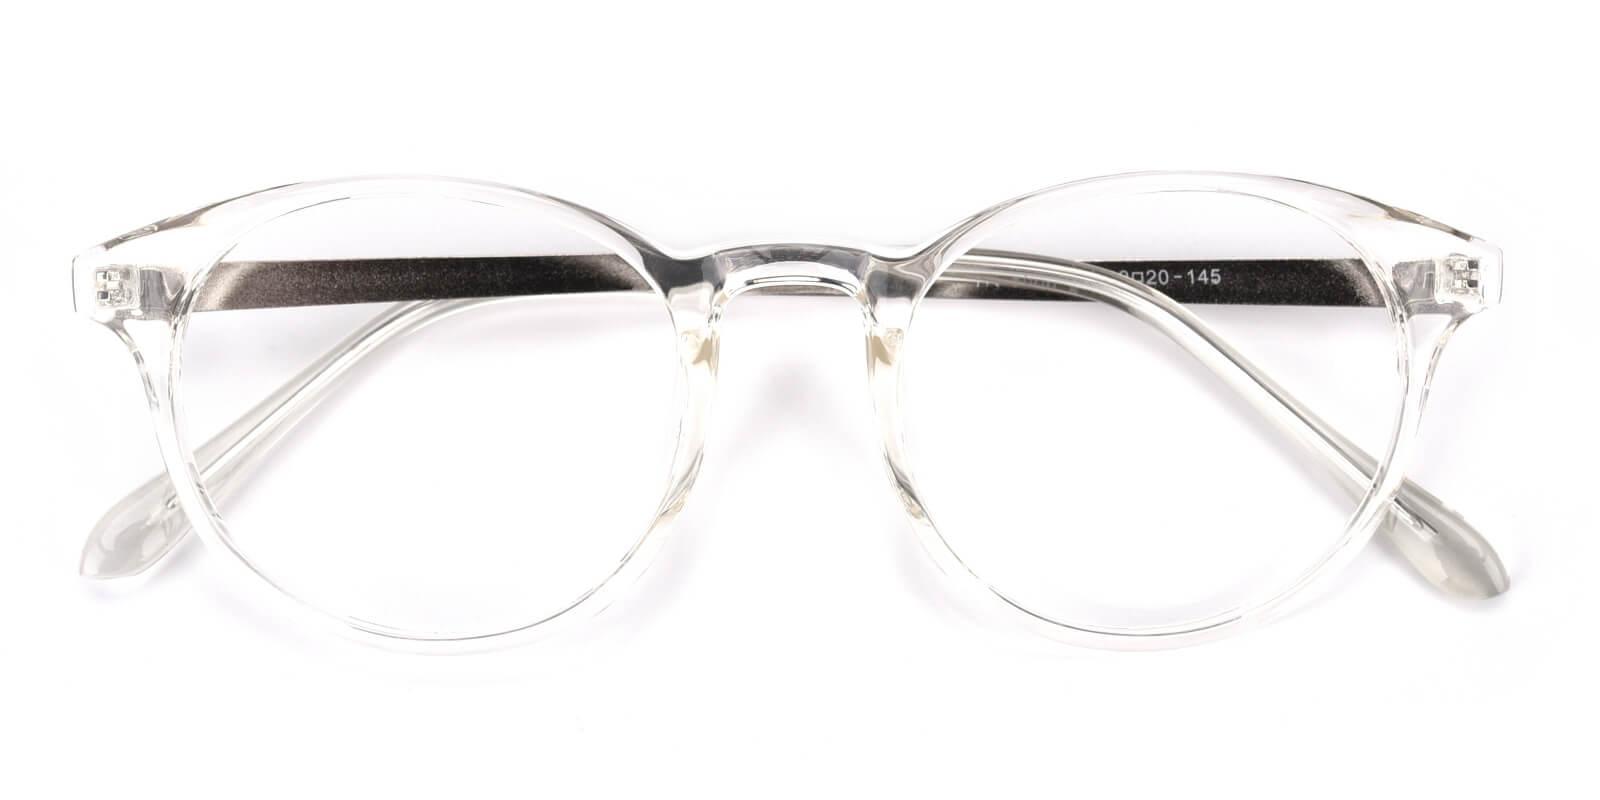 Zaire-Translucent-Round-Metal / TR-Eyeglasses-detail